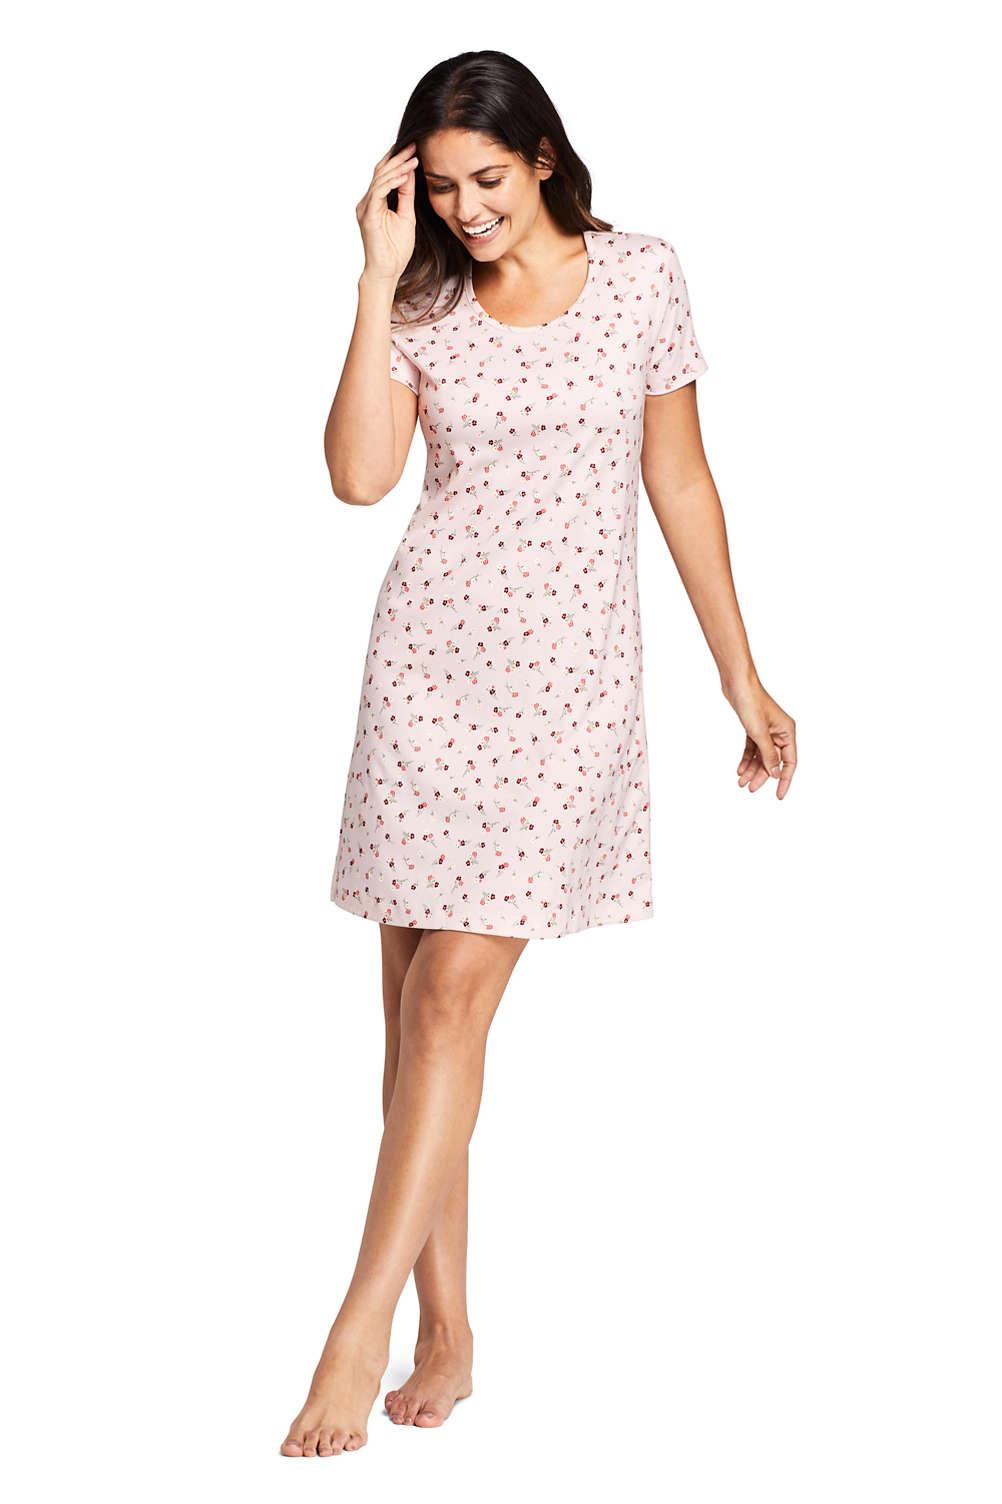 0bcc74640 Women's Supima Cotton Short Sleeve Knee Length Nightgown - Print ...